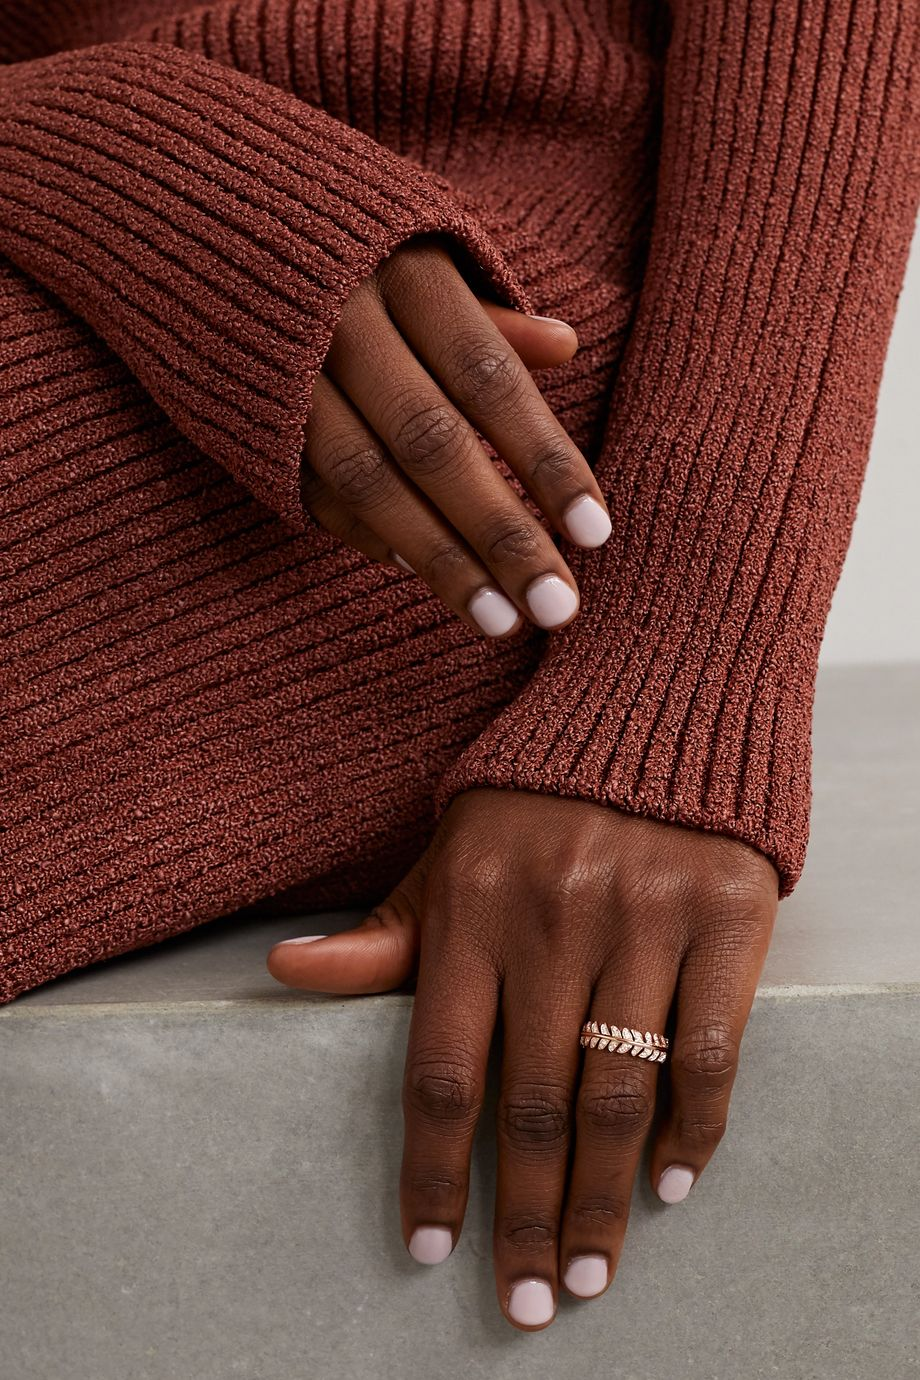 Boucheron Plume de Paon Ring aus 18 Karat Roségold mit Diamanten